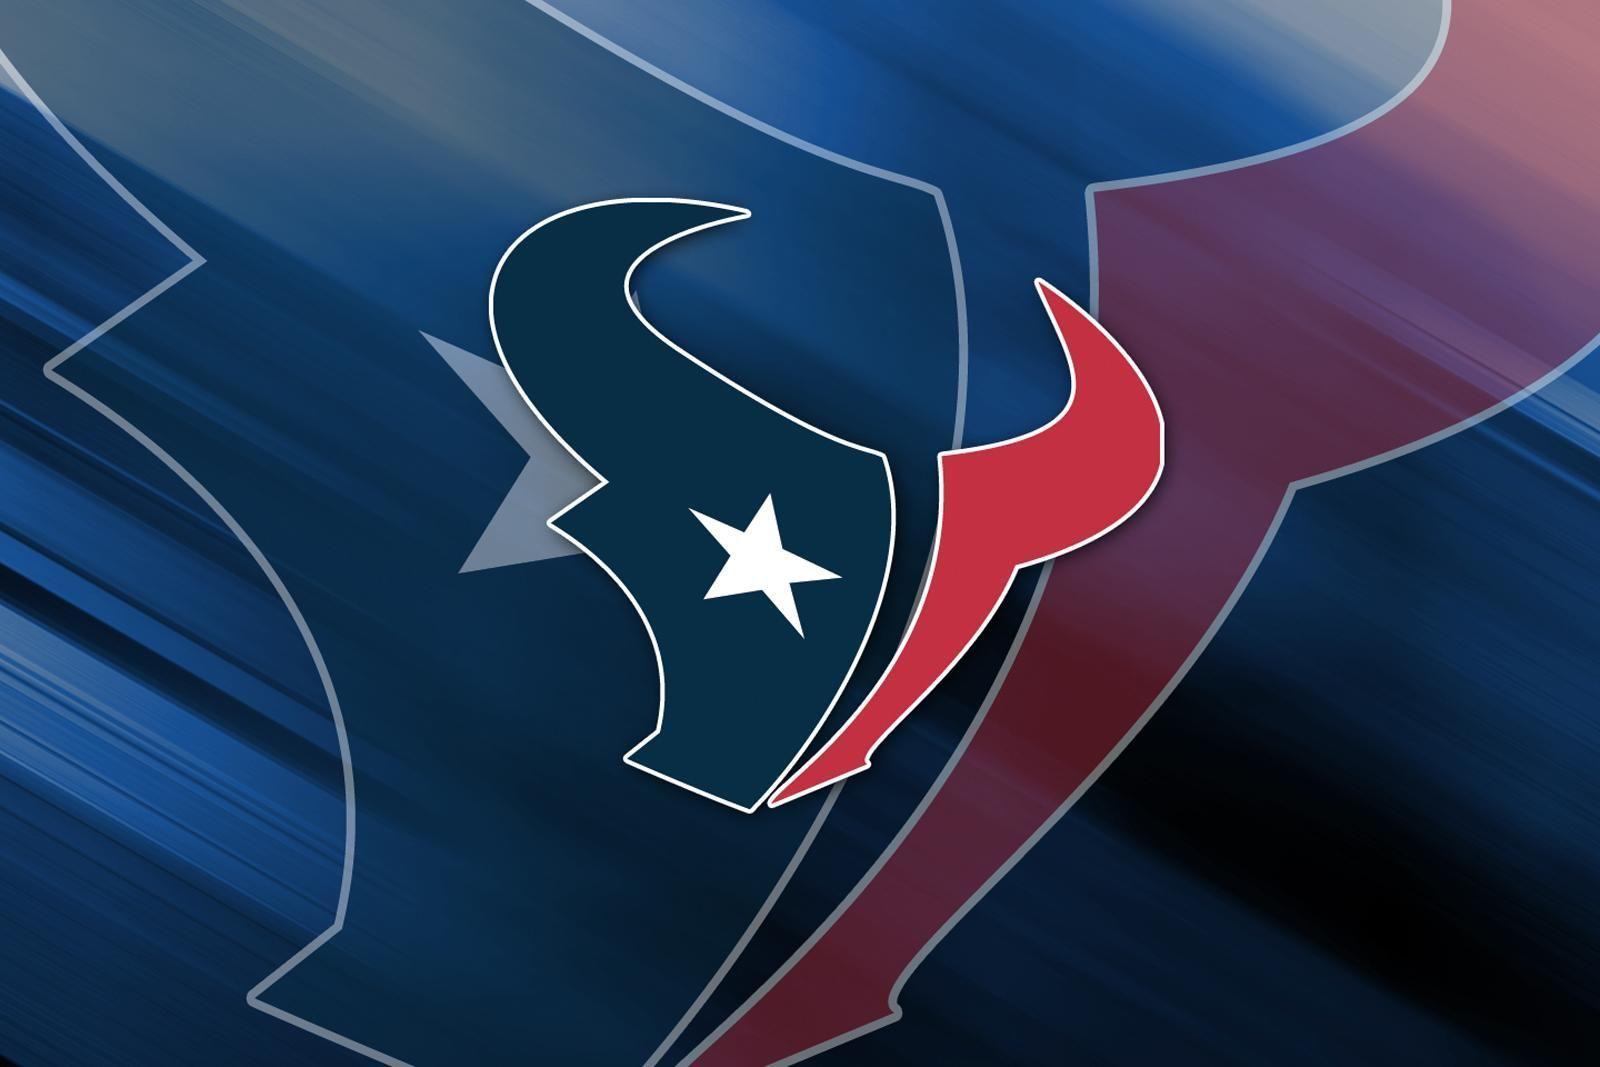 Houston Texans Wallpapers 2016 1600x1067